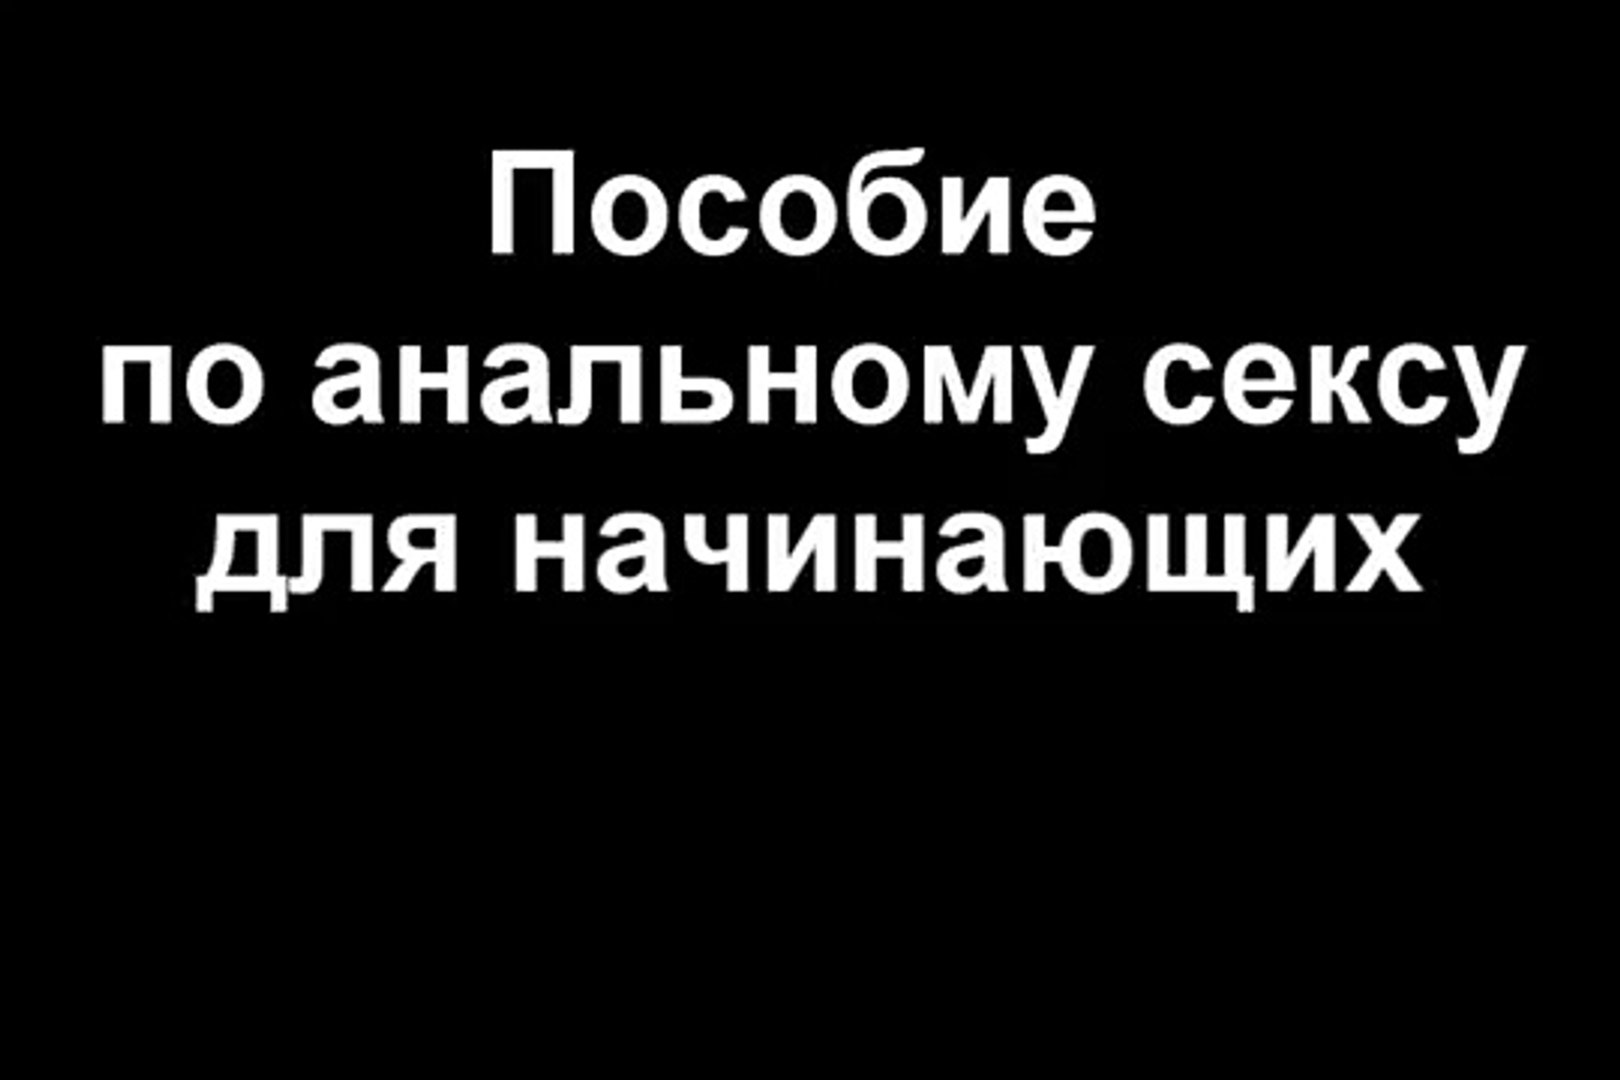 Русские пособие по анальному сексу порно пизда